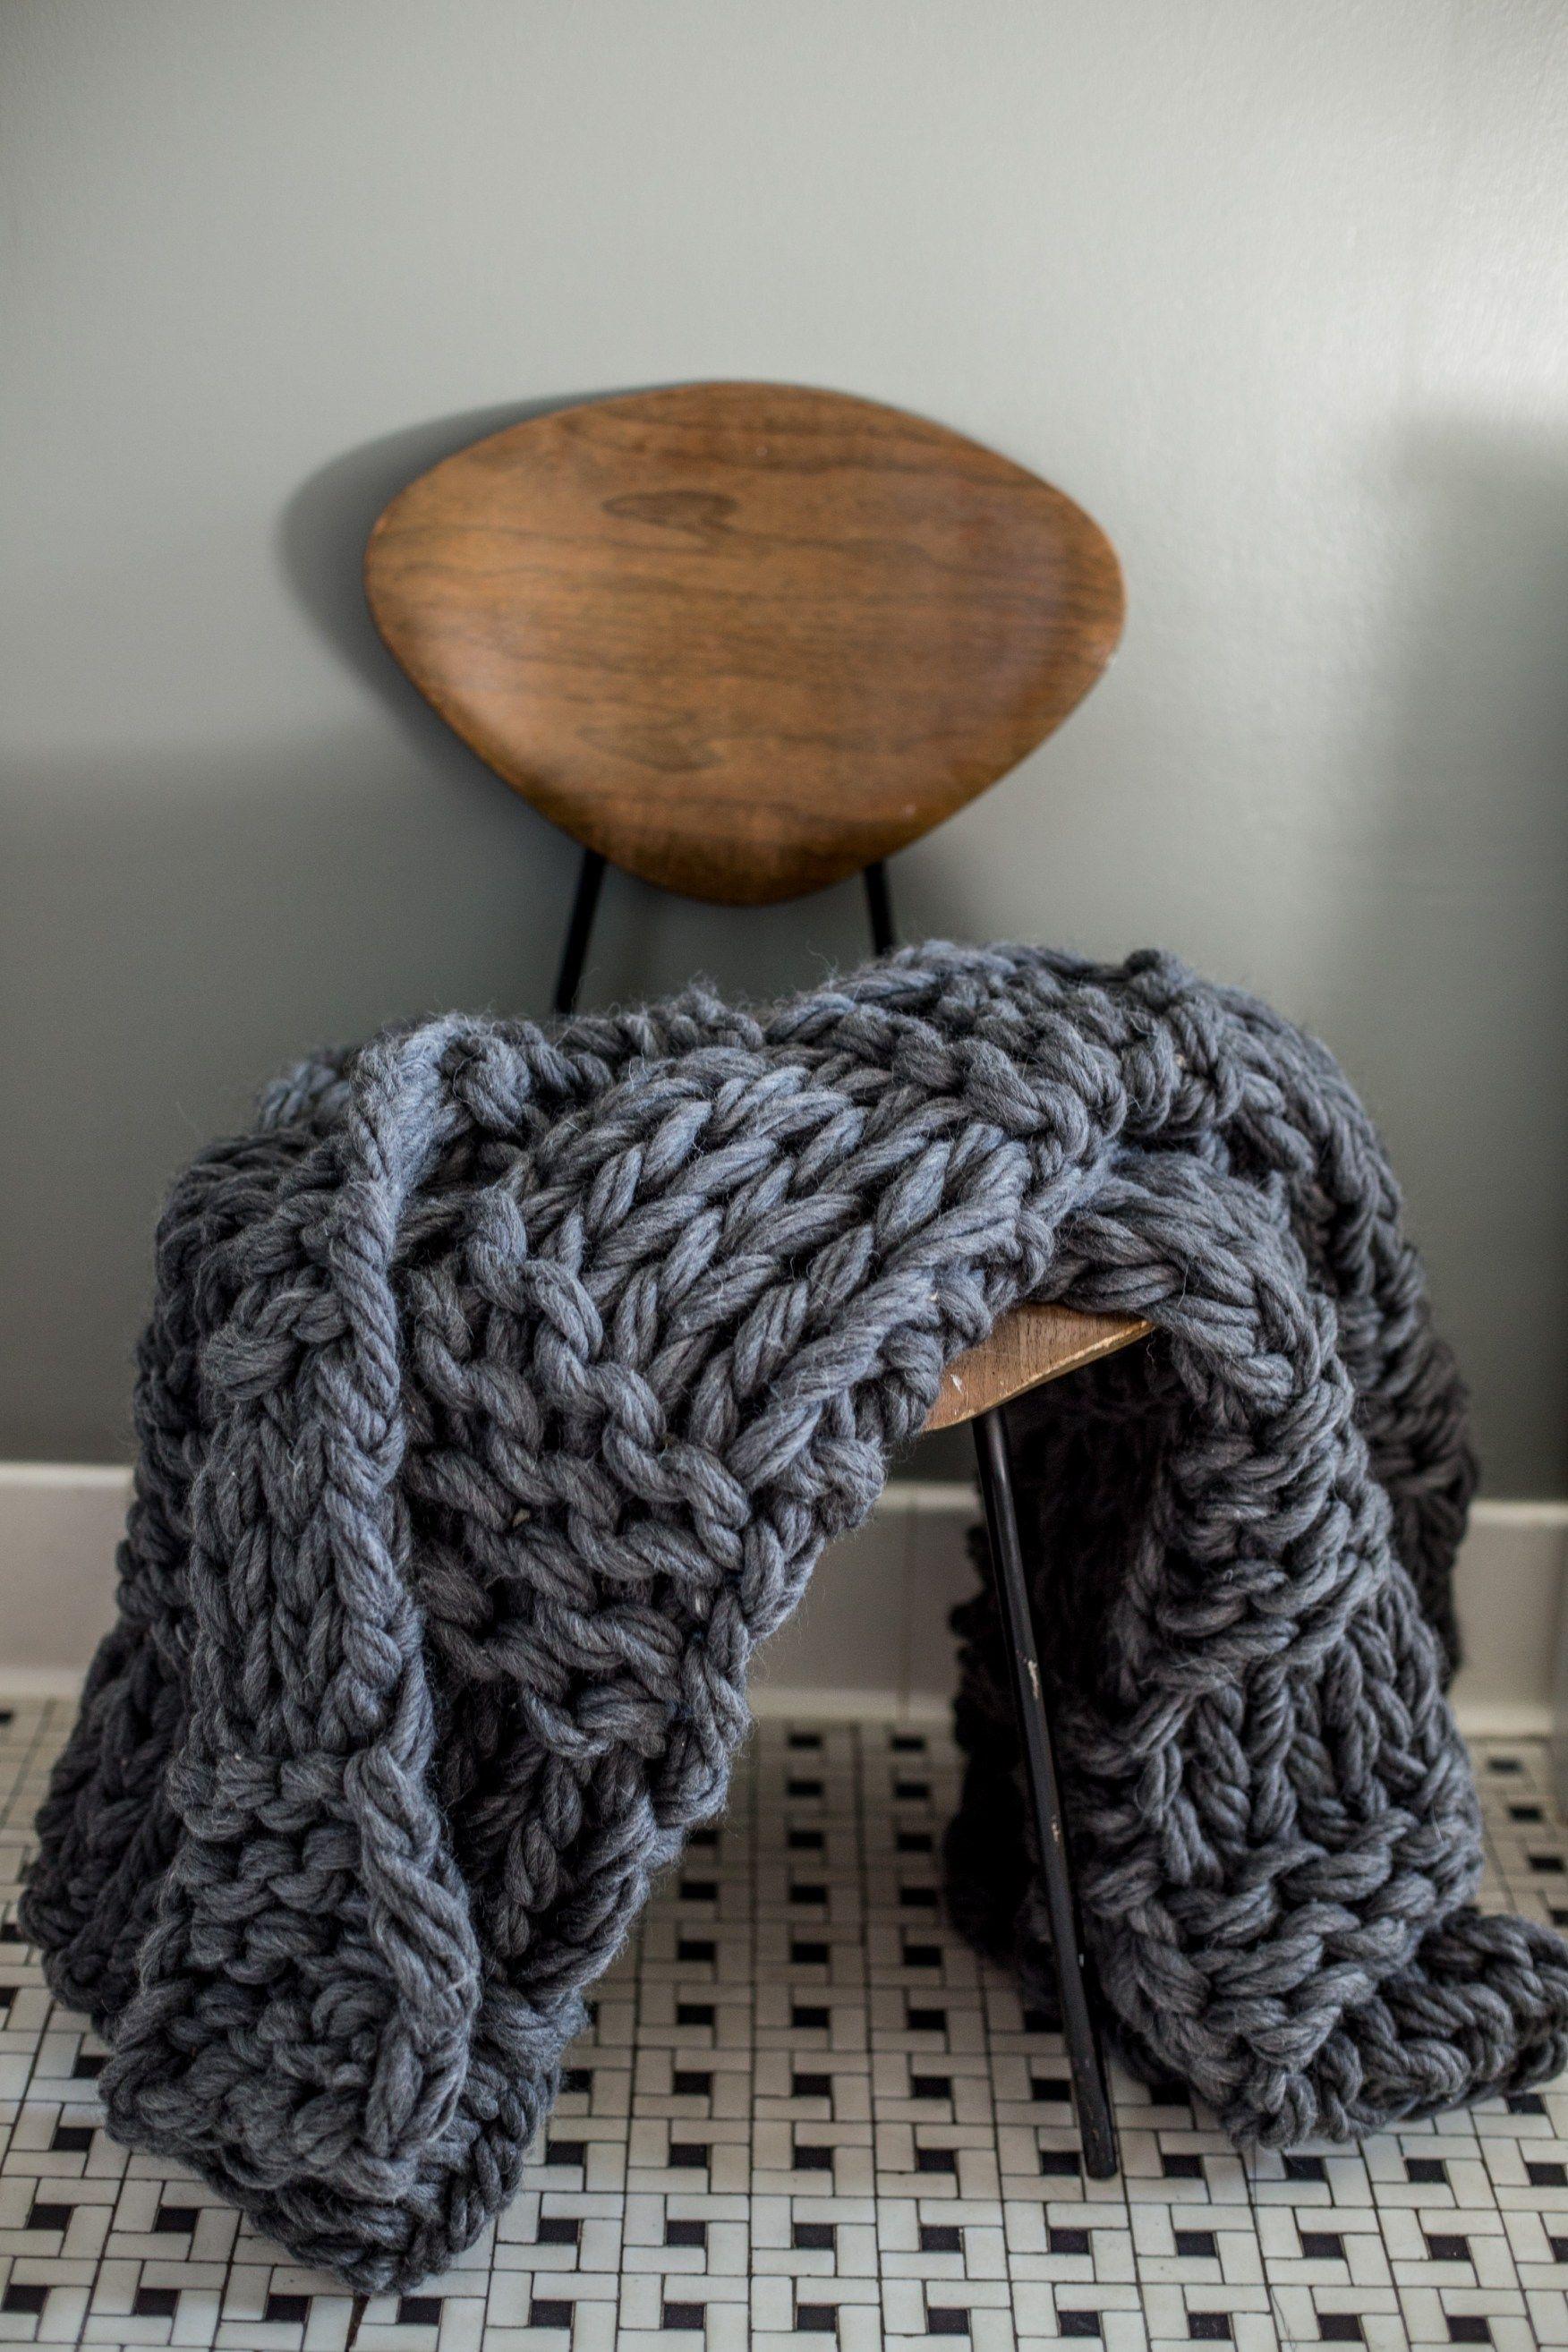 Chunky Arm Knit Blanket Pattern   Knitting blanket patterns, Arm ...